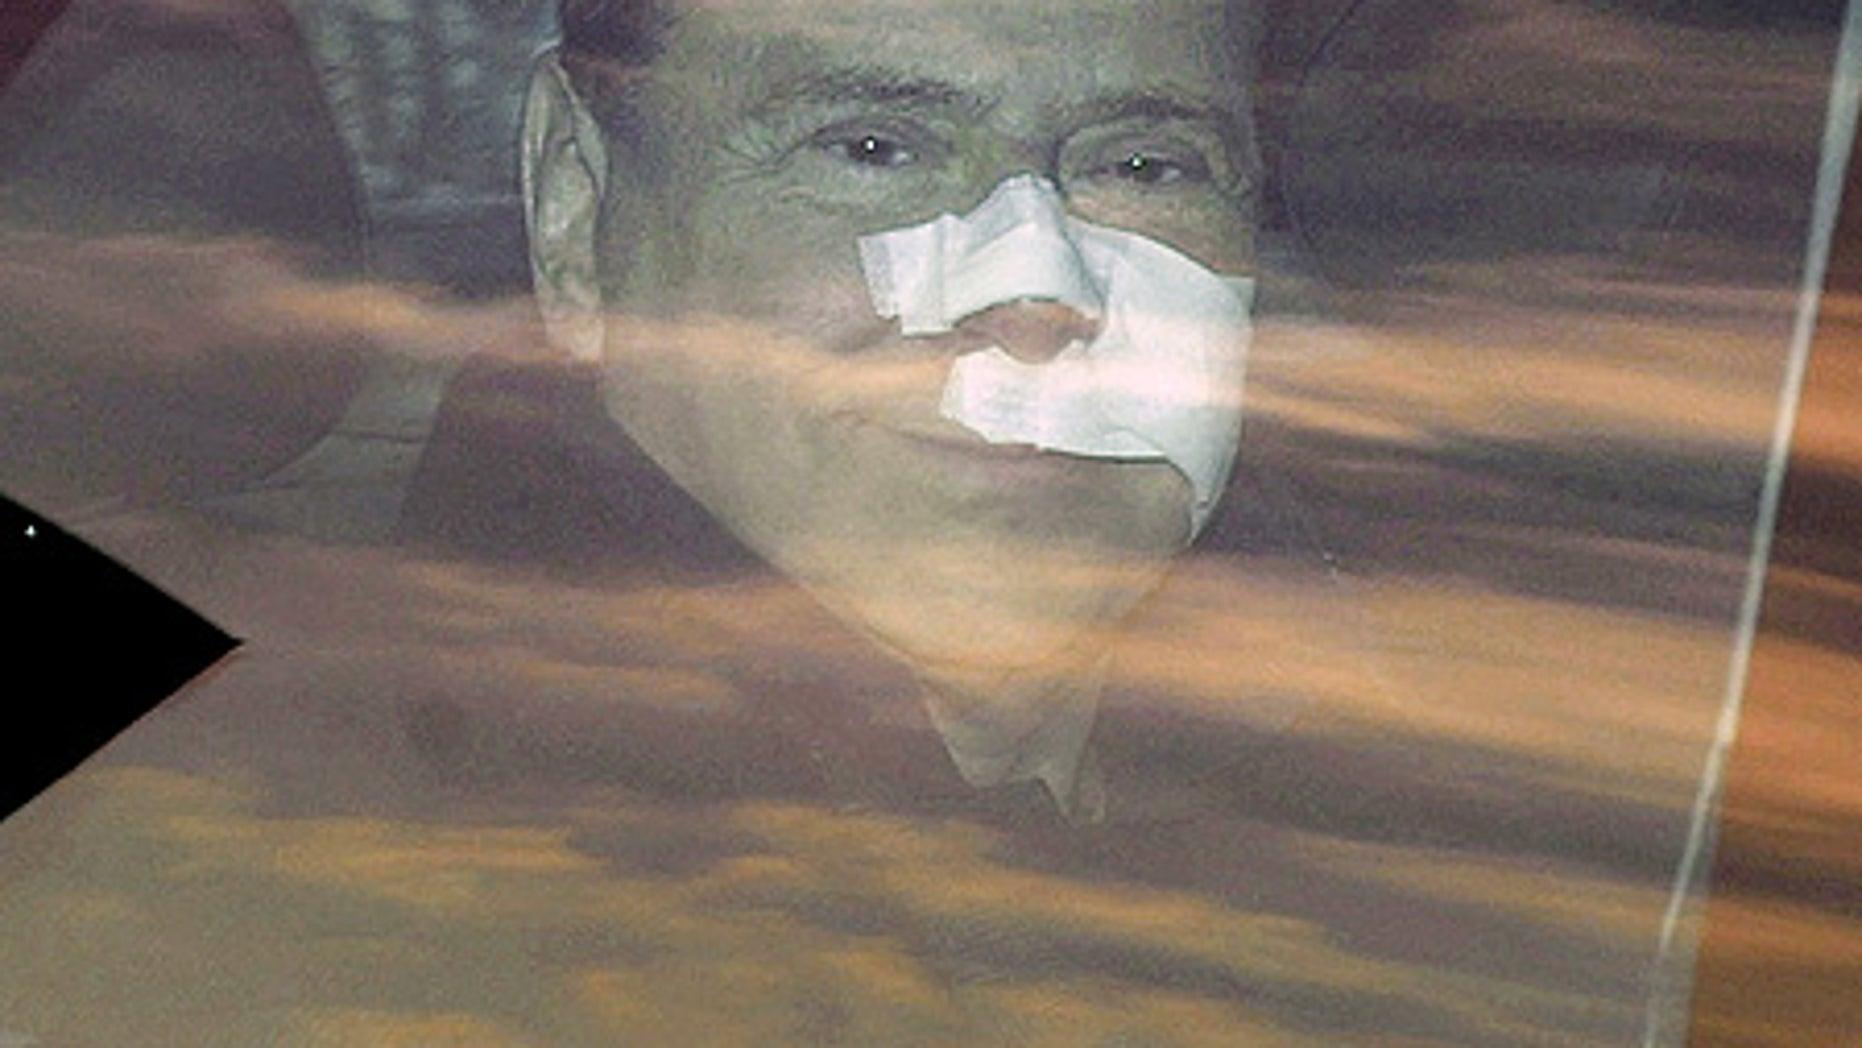 Dec. 17: Italian Premier Silvio Berlusconi, his face bandaged, leaves a Milan hospital.